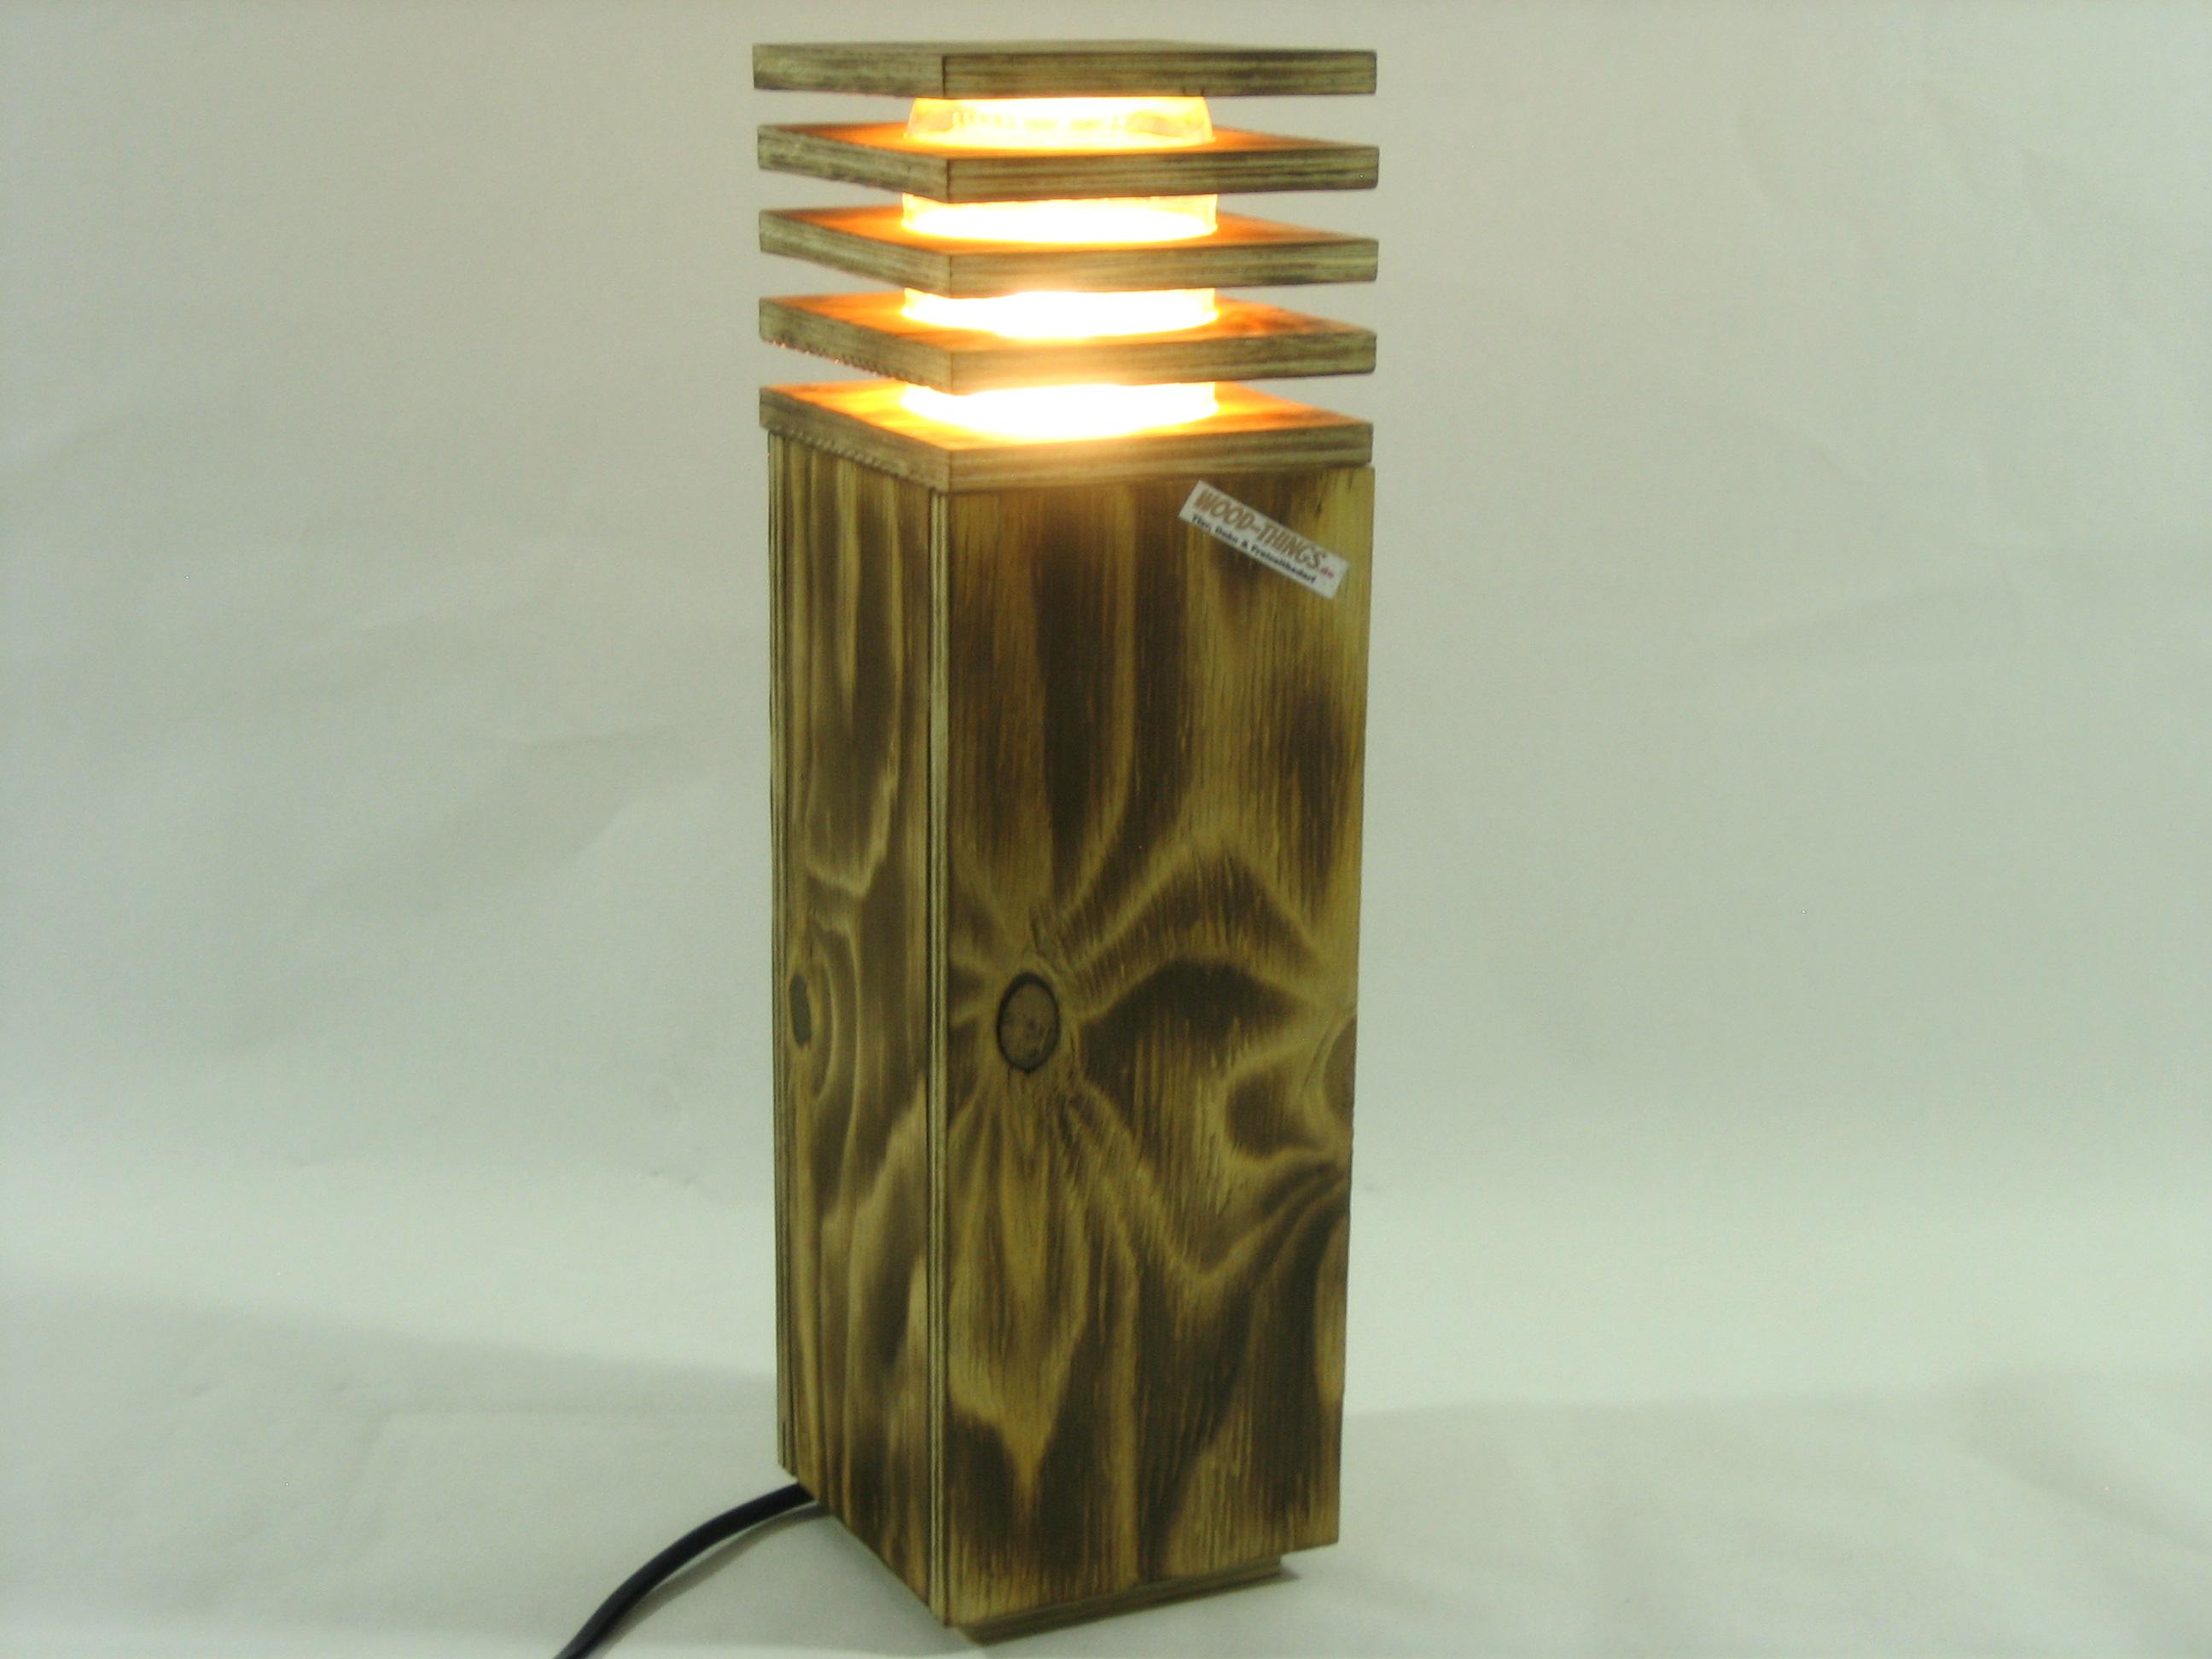 Wood rustikale holzlampe mit led technik for Led holzlampe